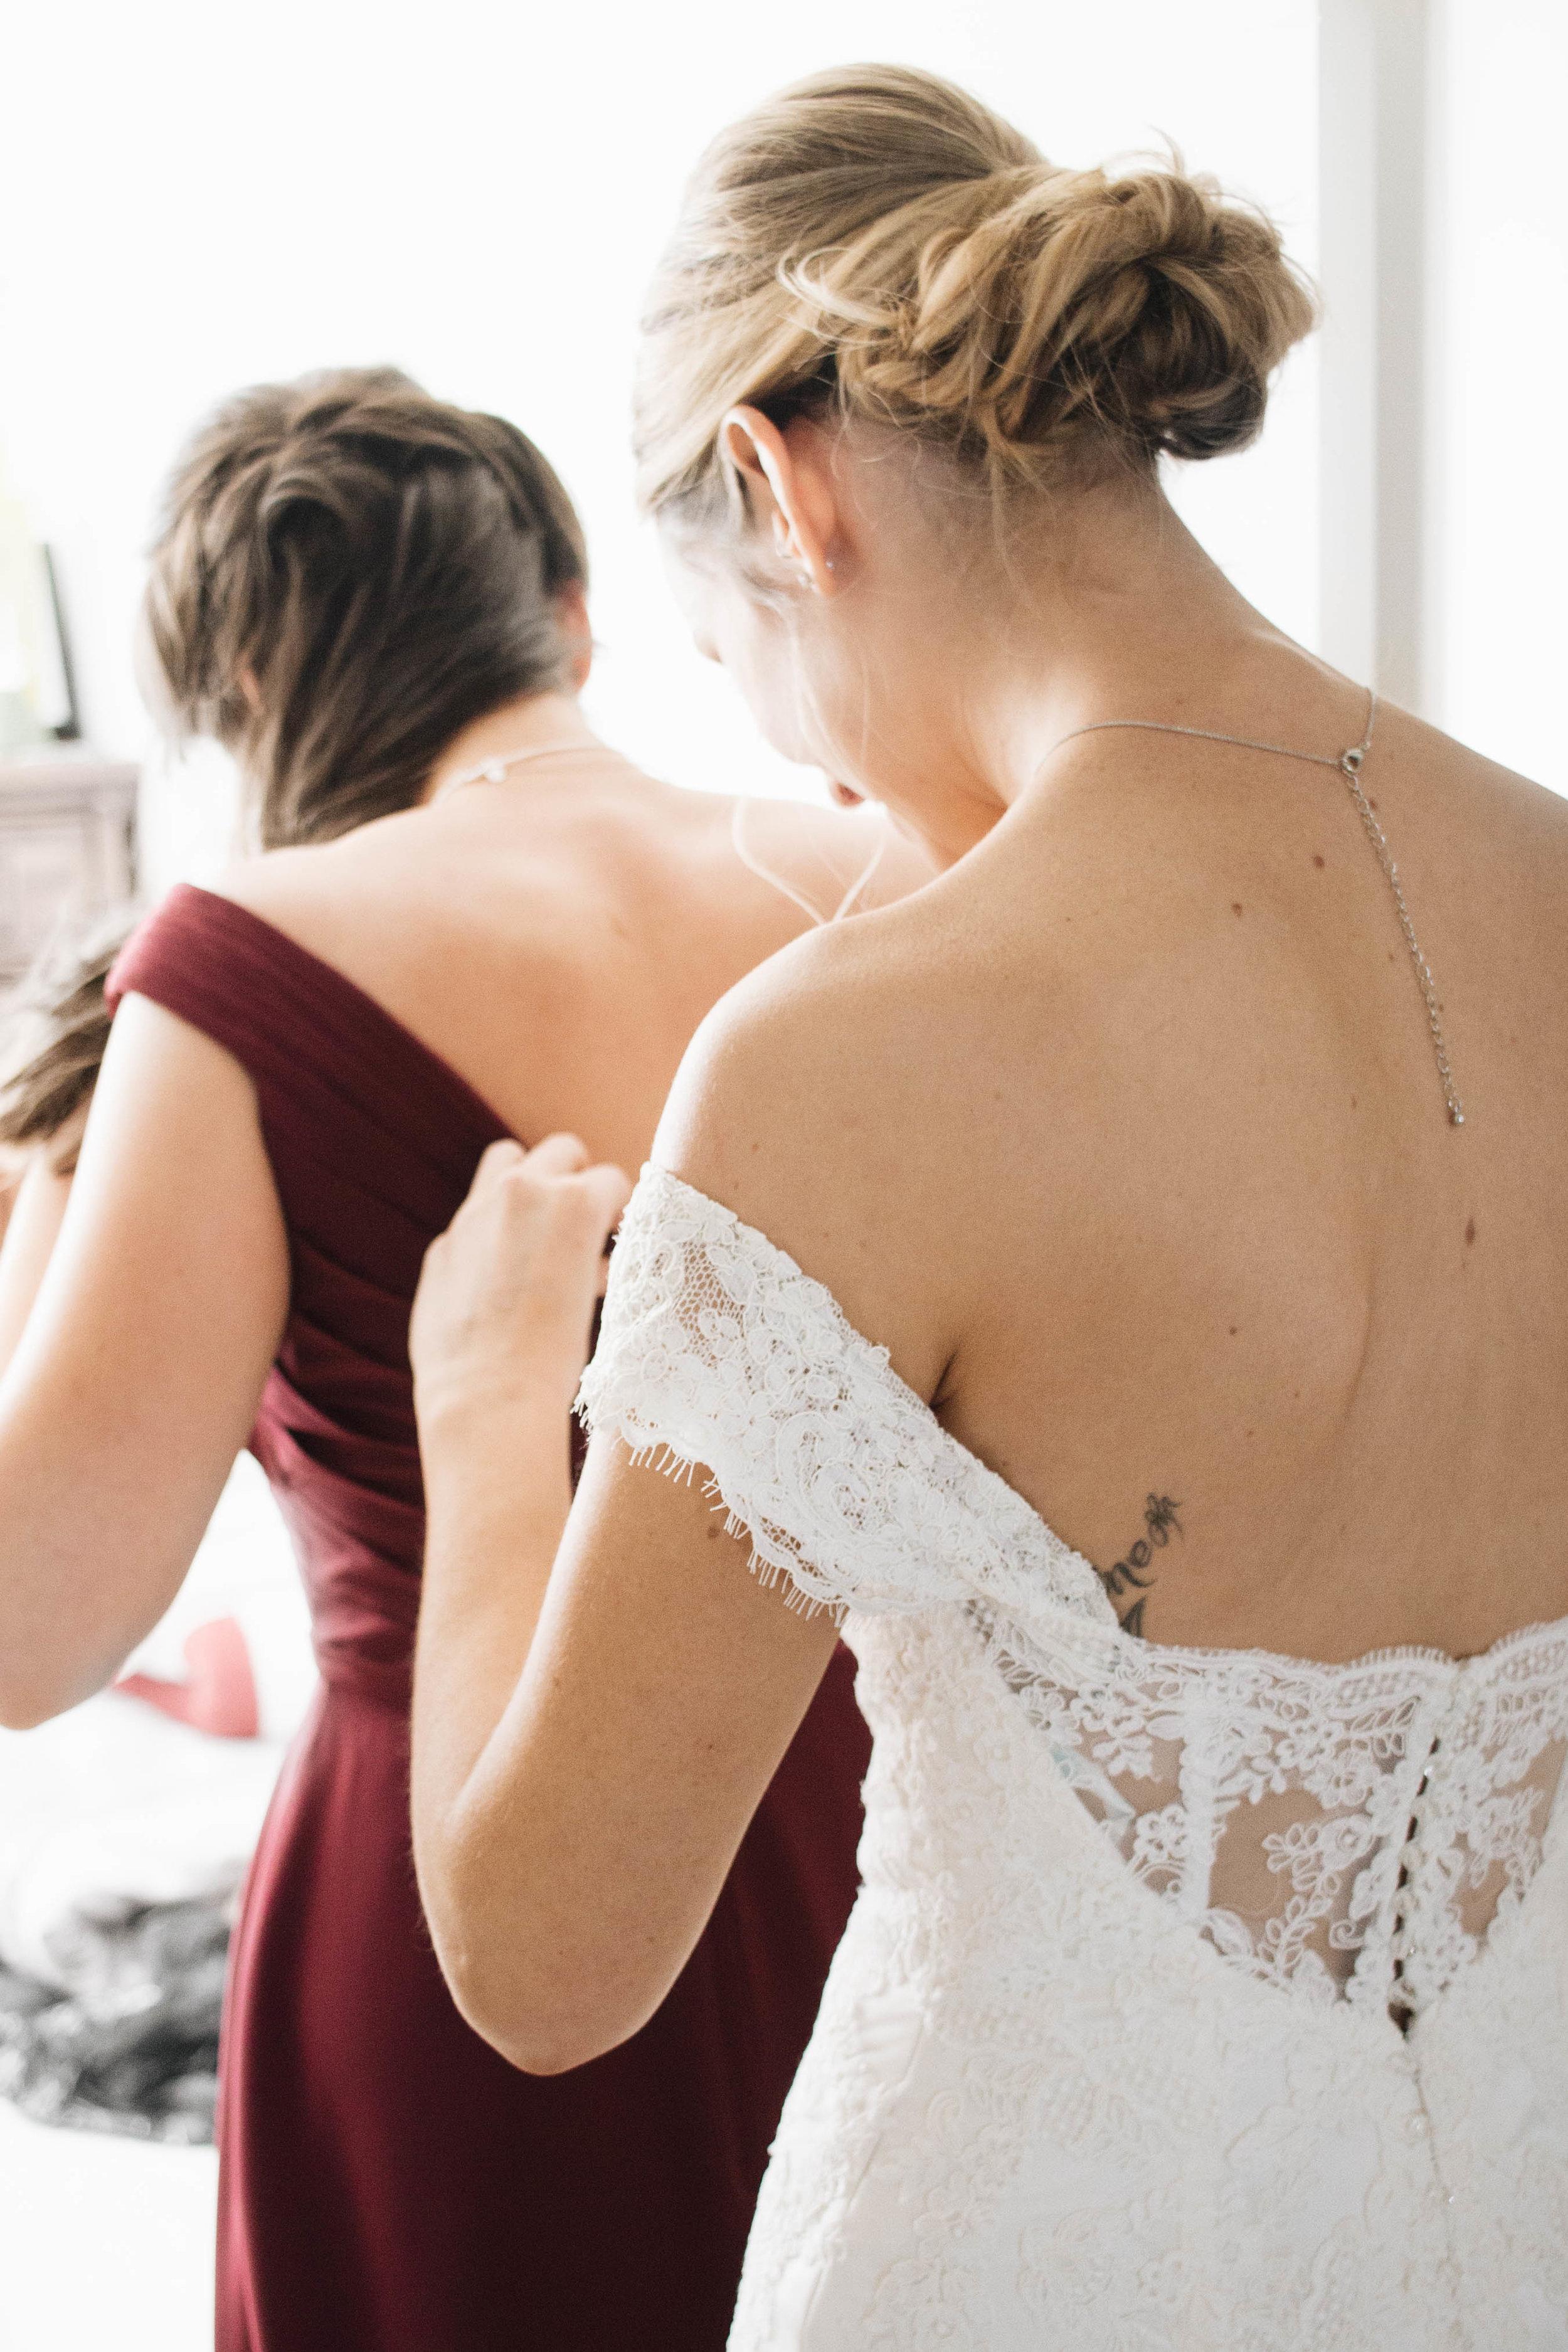 jenna-getting-married-115.jpg